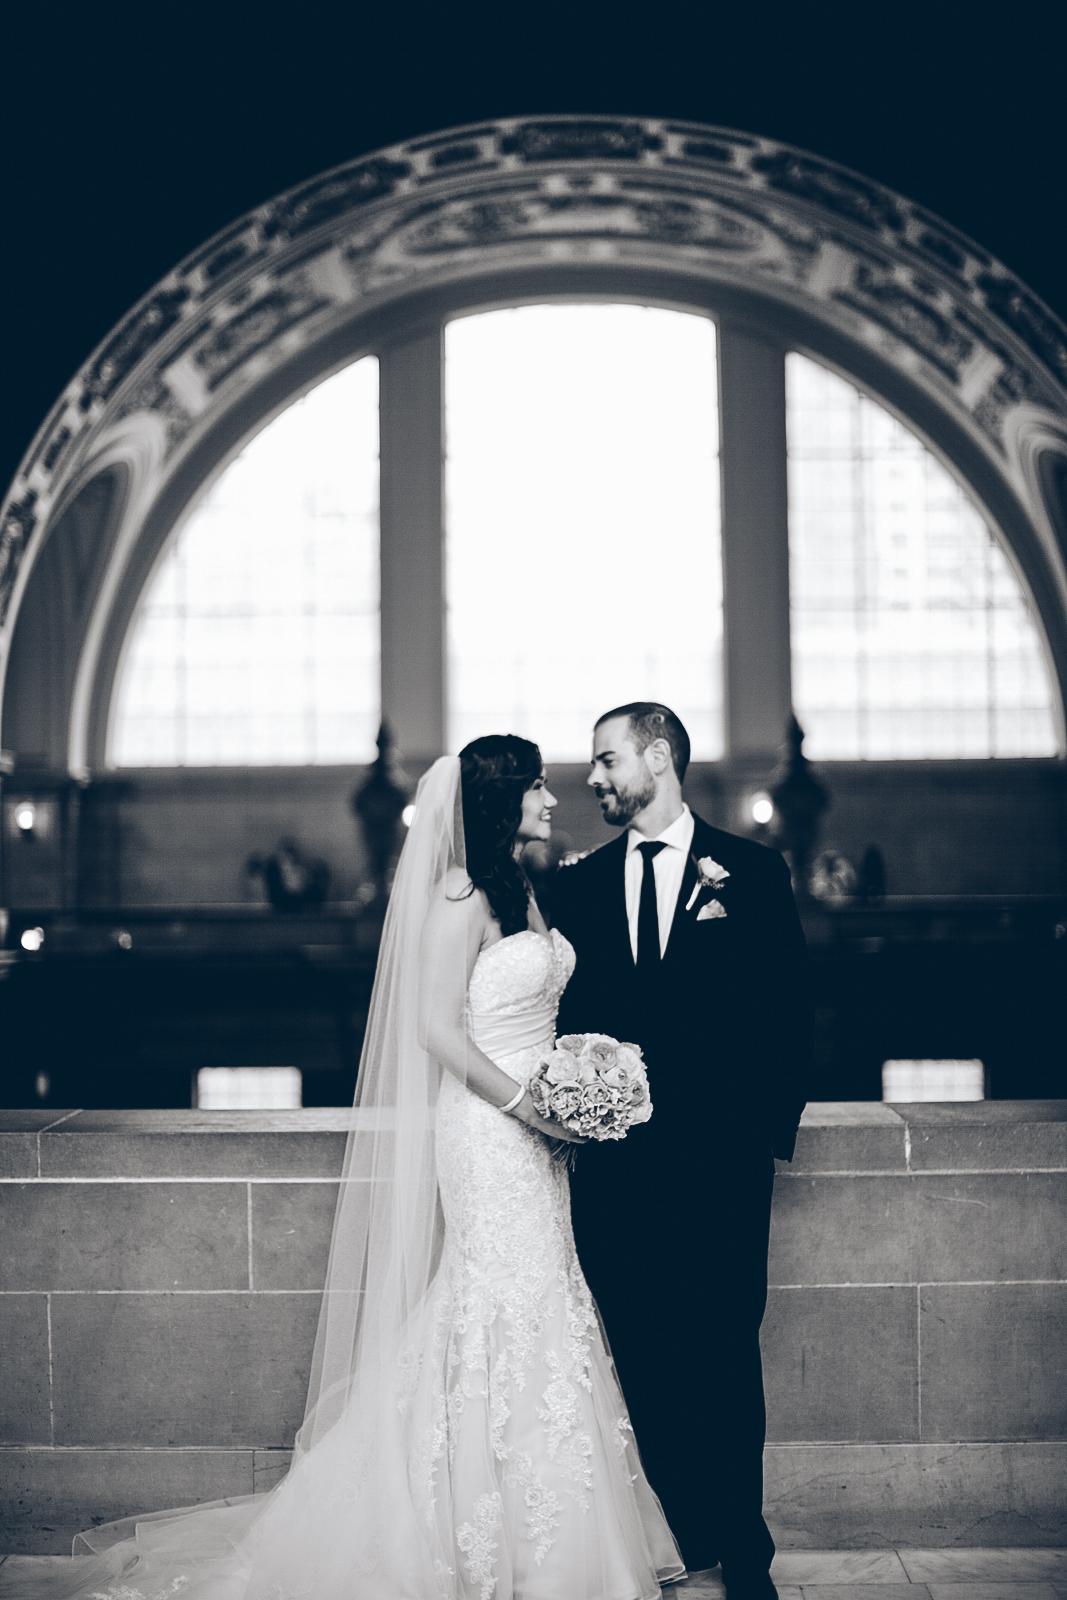 San_francisco_city_hall_wedding_photography_meegan_travis_ebony_siovhan_bokeh_photography_34.jpg